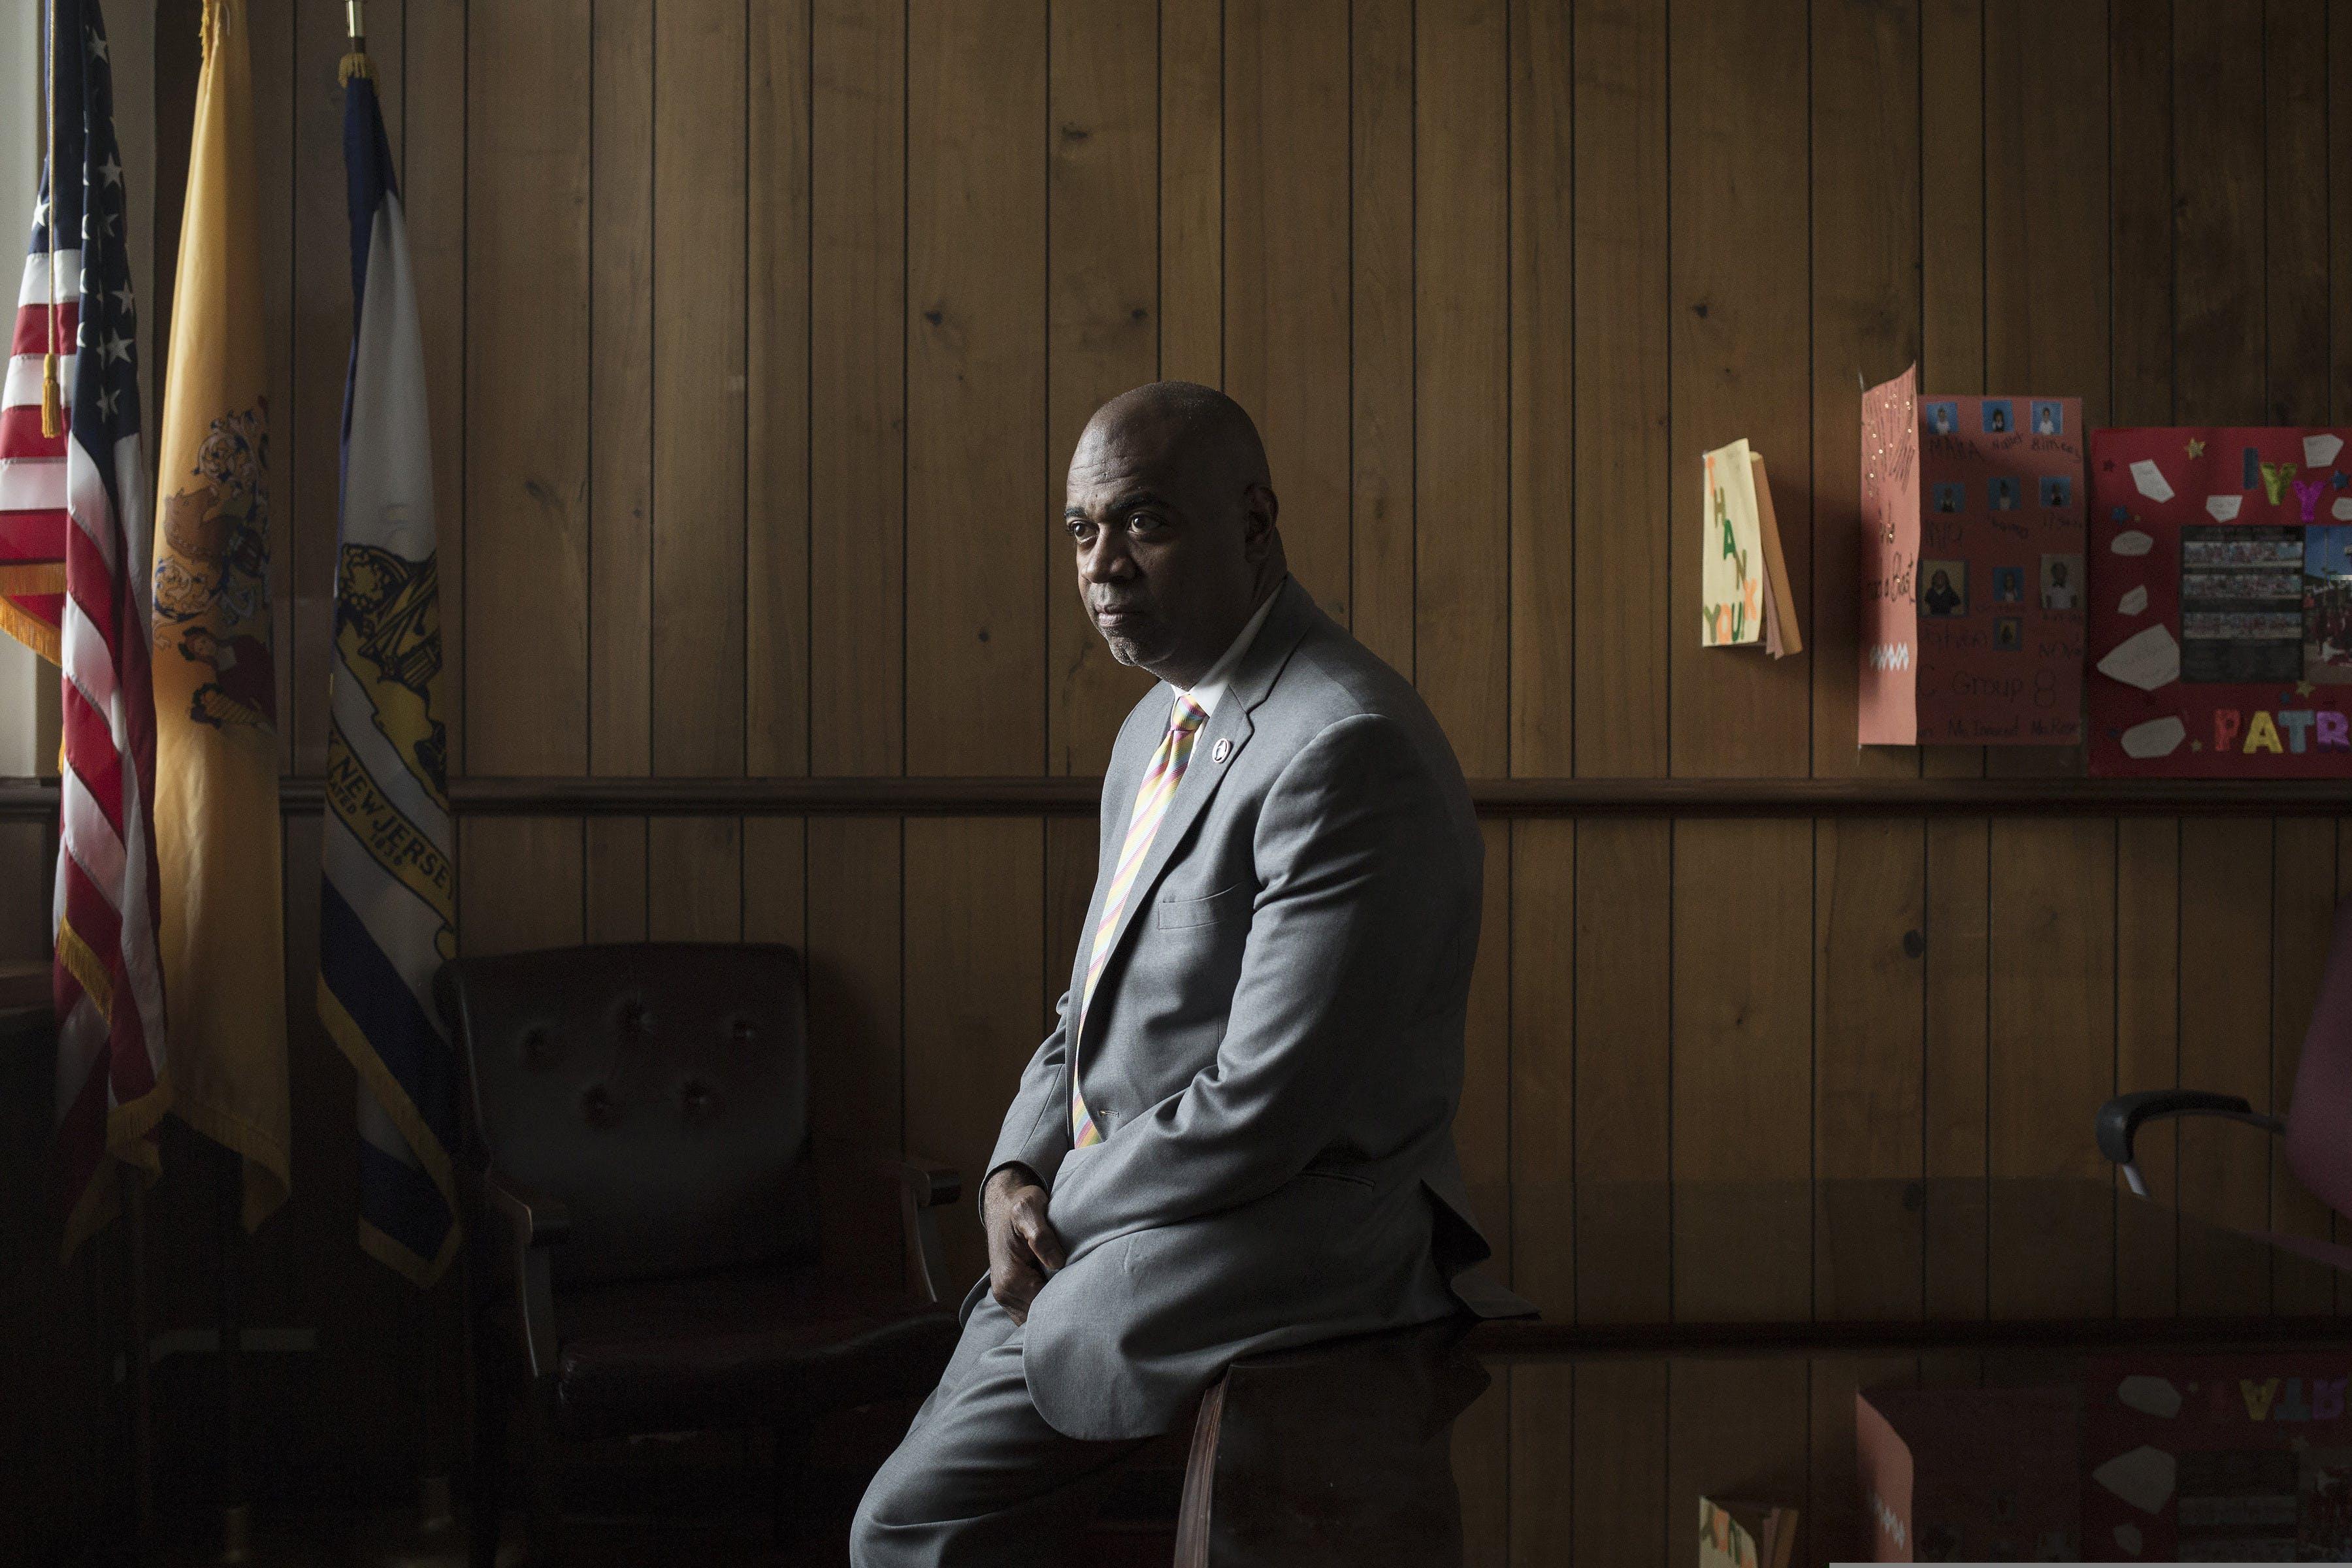 Mayor Ras Baraka in his office at City Hall in Newark, N.J., on May 4, 2018.